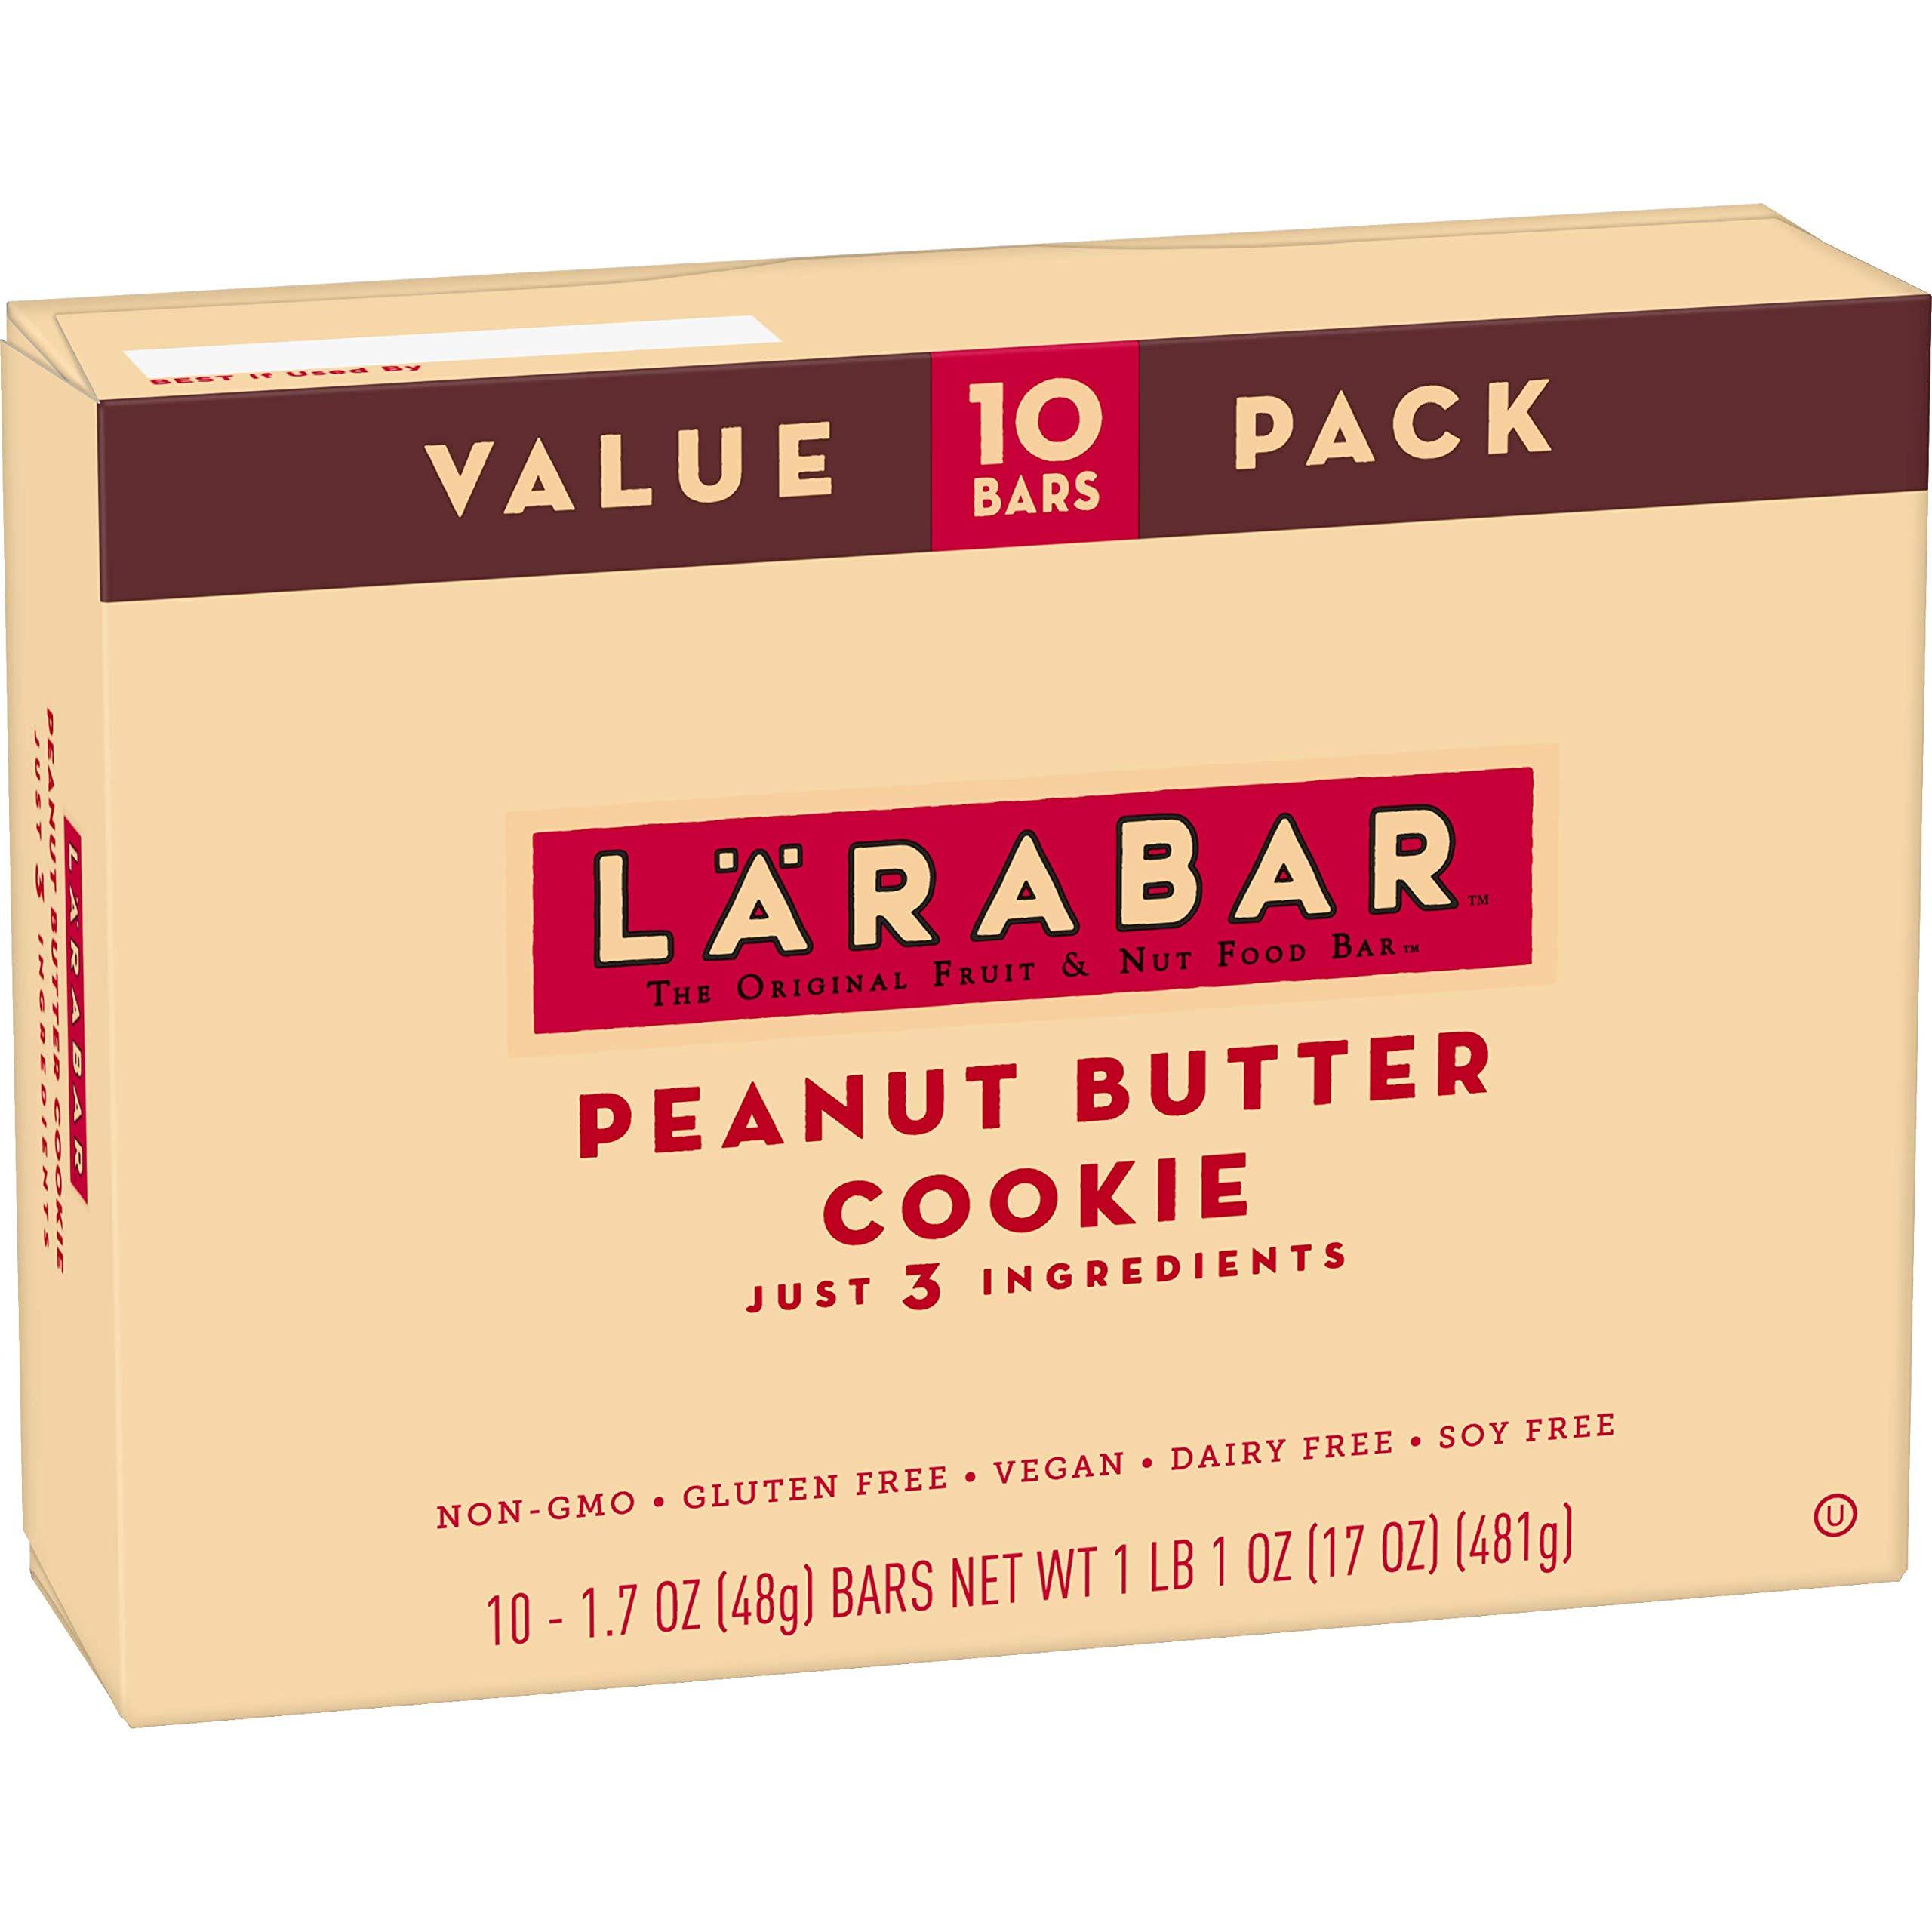 Larabar Gluten Free Bar, Peanut Butter Cookie, 1.7 oz Bars (10 Count), Whole Food Gluten Free Bars, Dairy Free Snacks by LÄRABAR